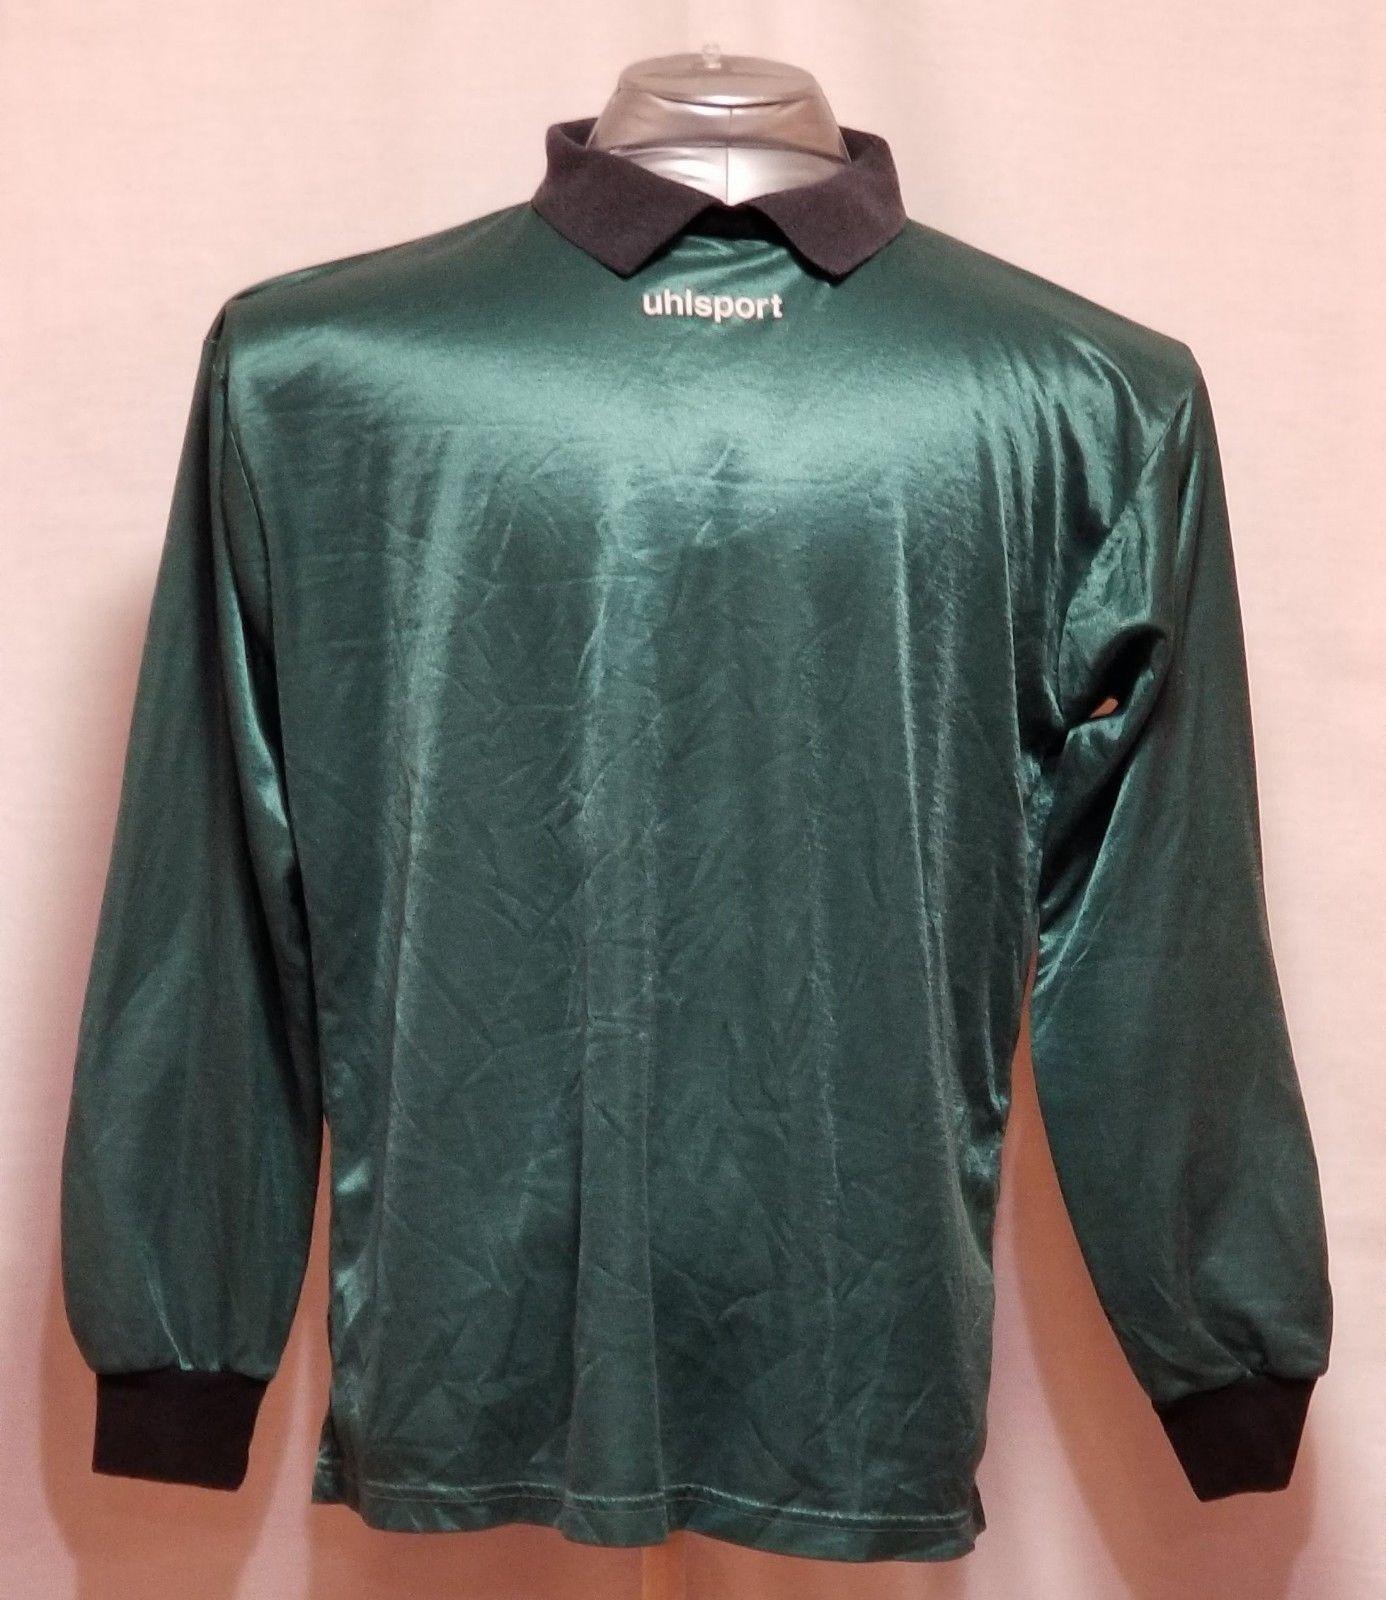 f0c9e3aeb10 Uhlsport Classics Green & Black Goalkeeper and 50 similar items